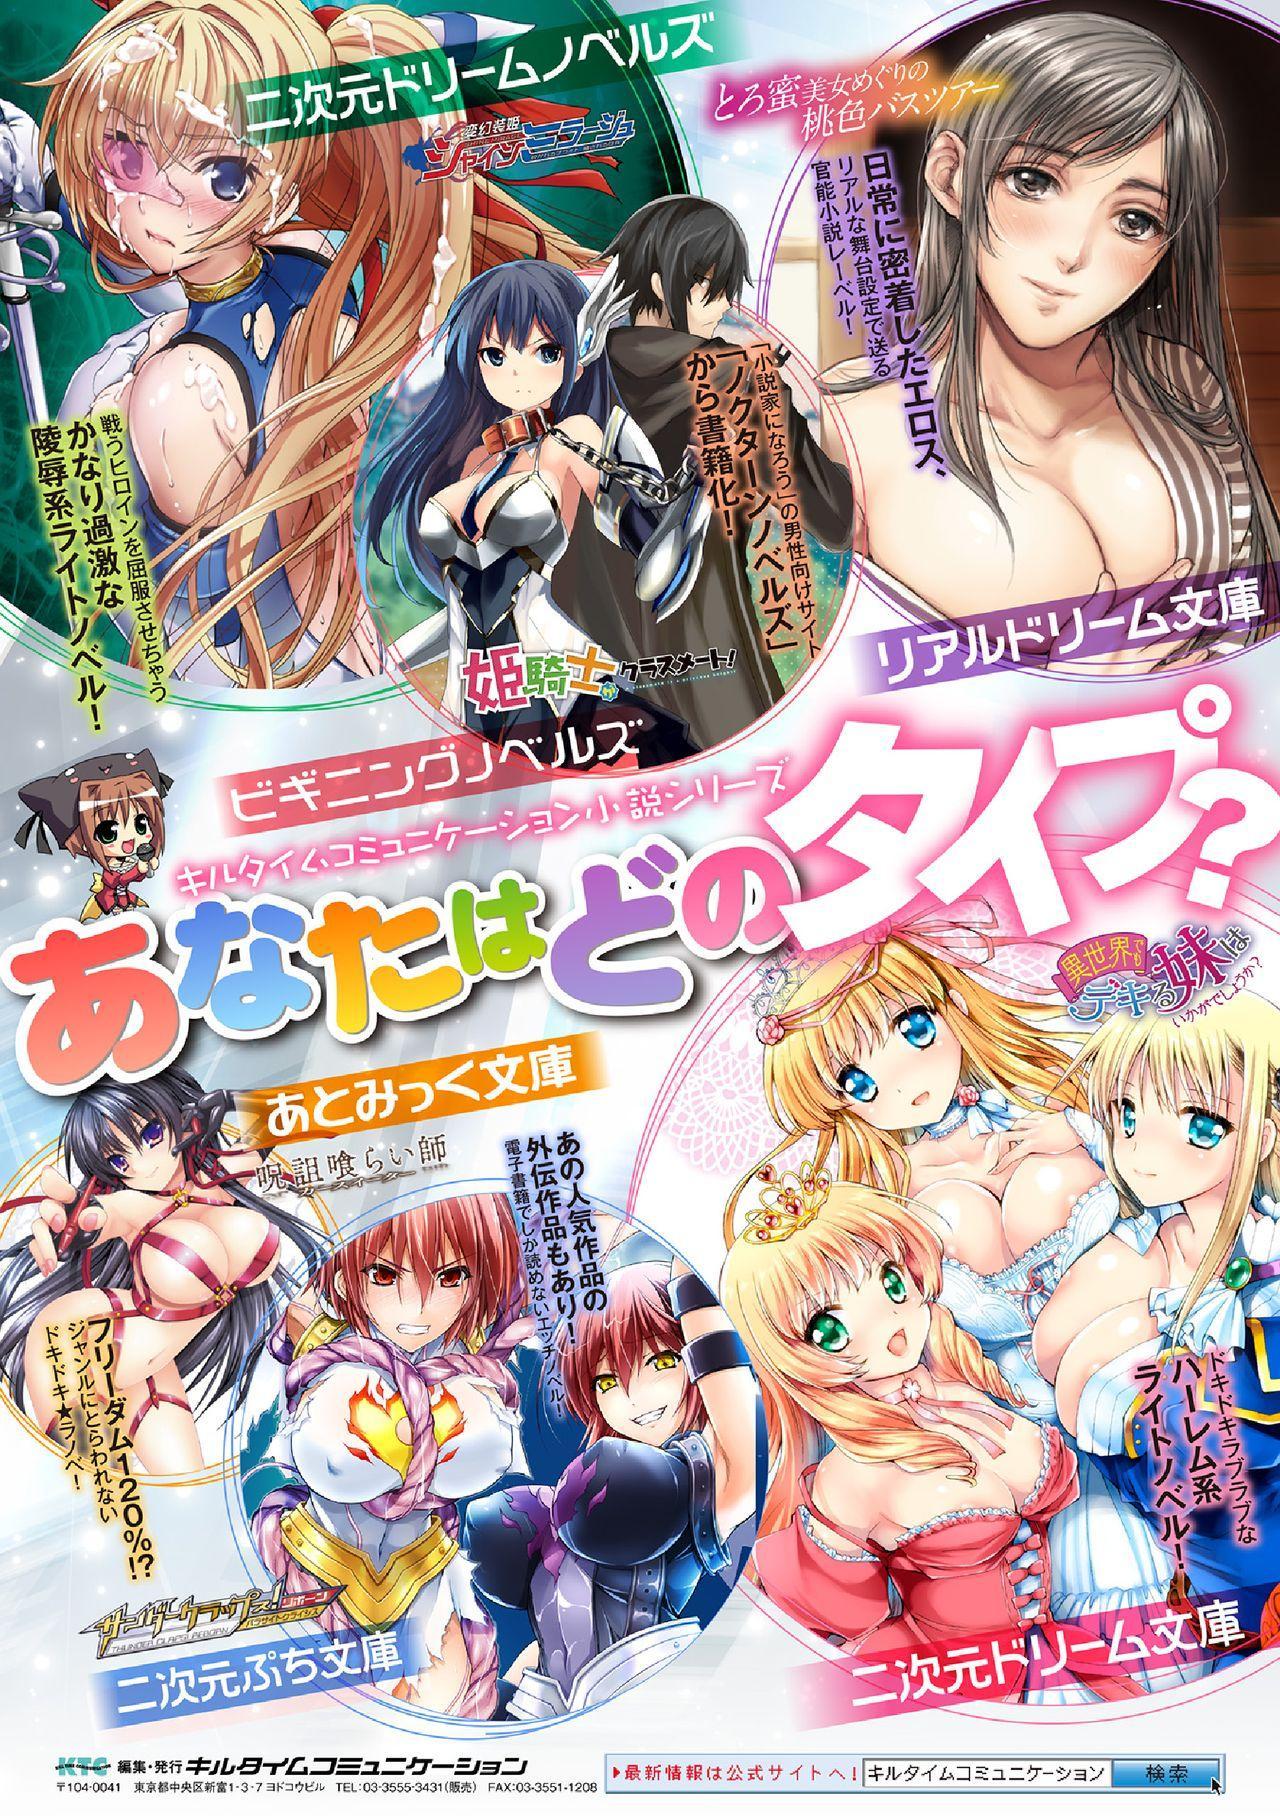 2D Comic Magazine Zecchou Kairaku ga Tomaranai Ero-Trap Dungeon Vol. 2 90